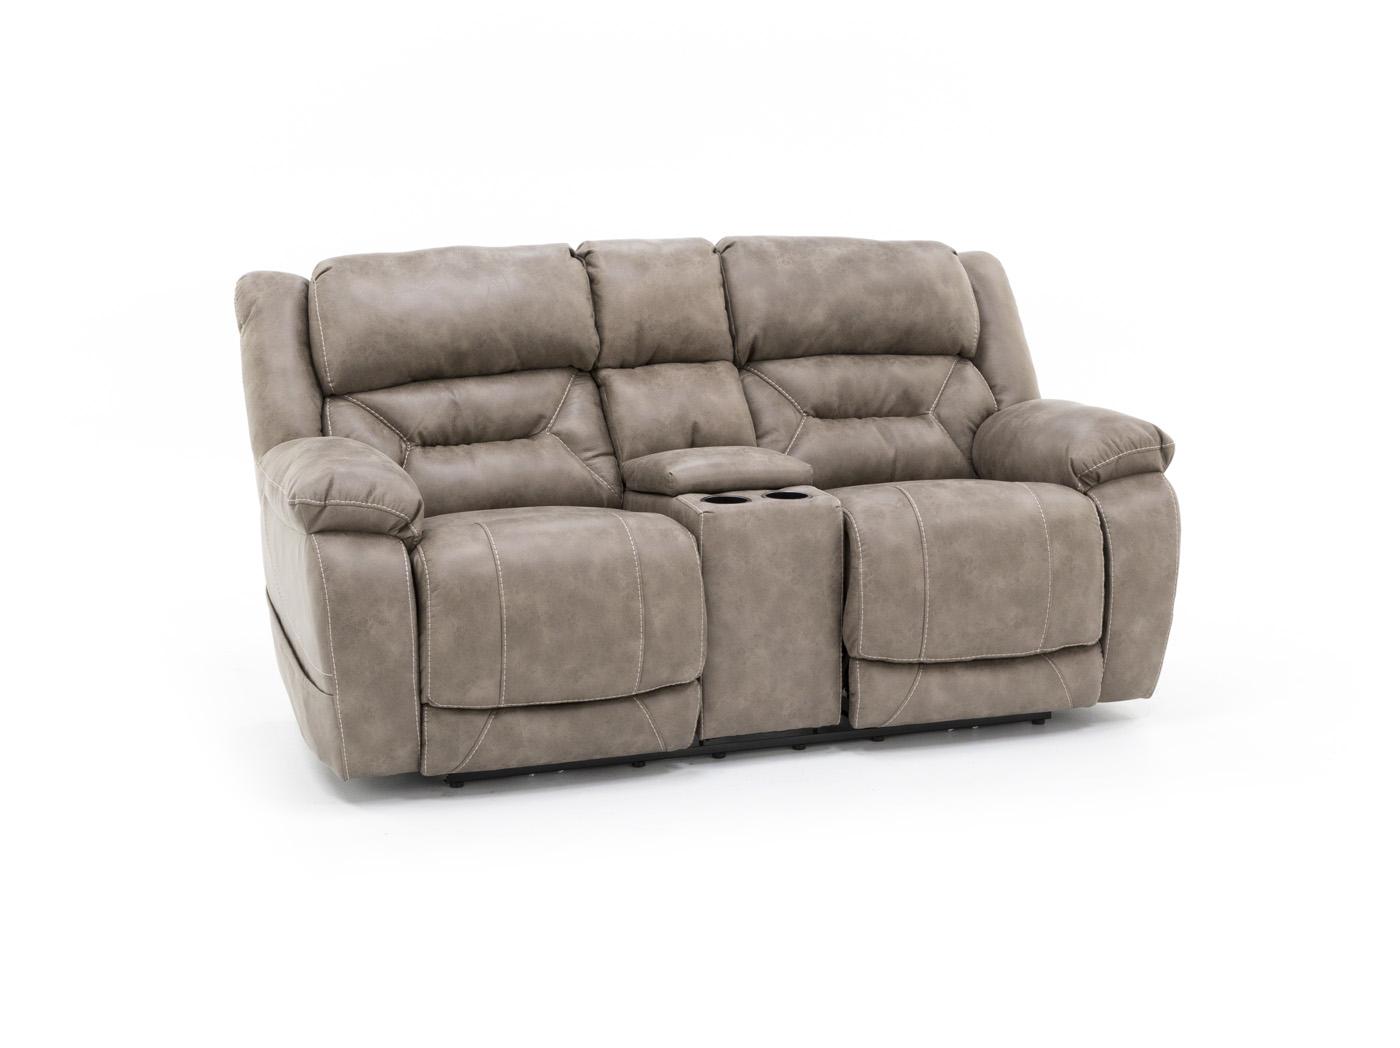 living room loveseats sectional sofa ideas steinhafels laramie power console loveseat